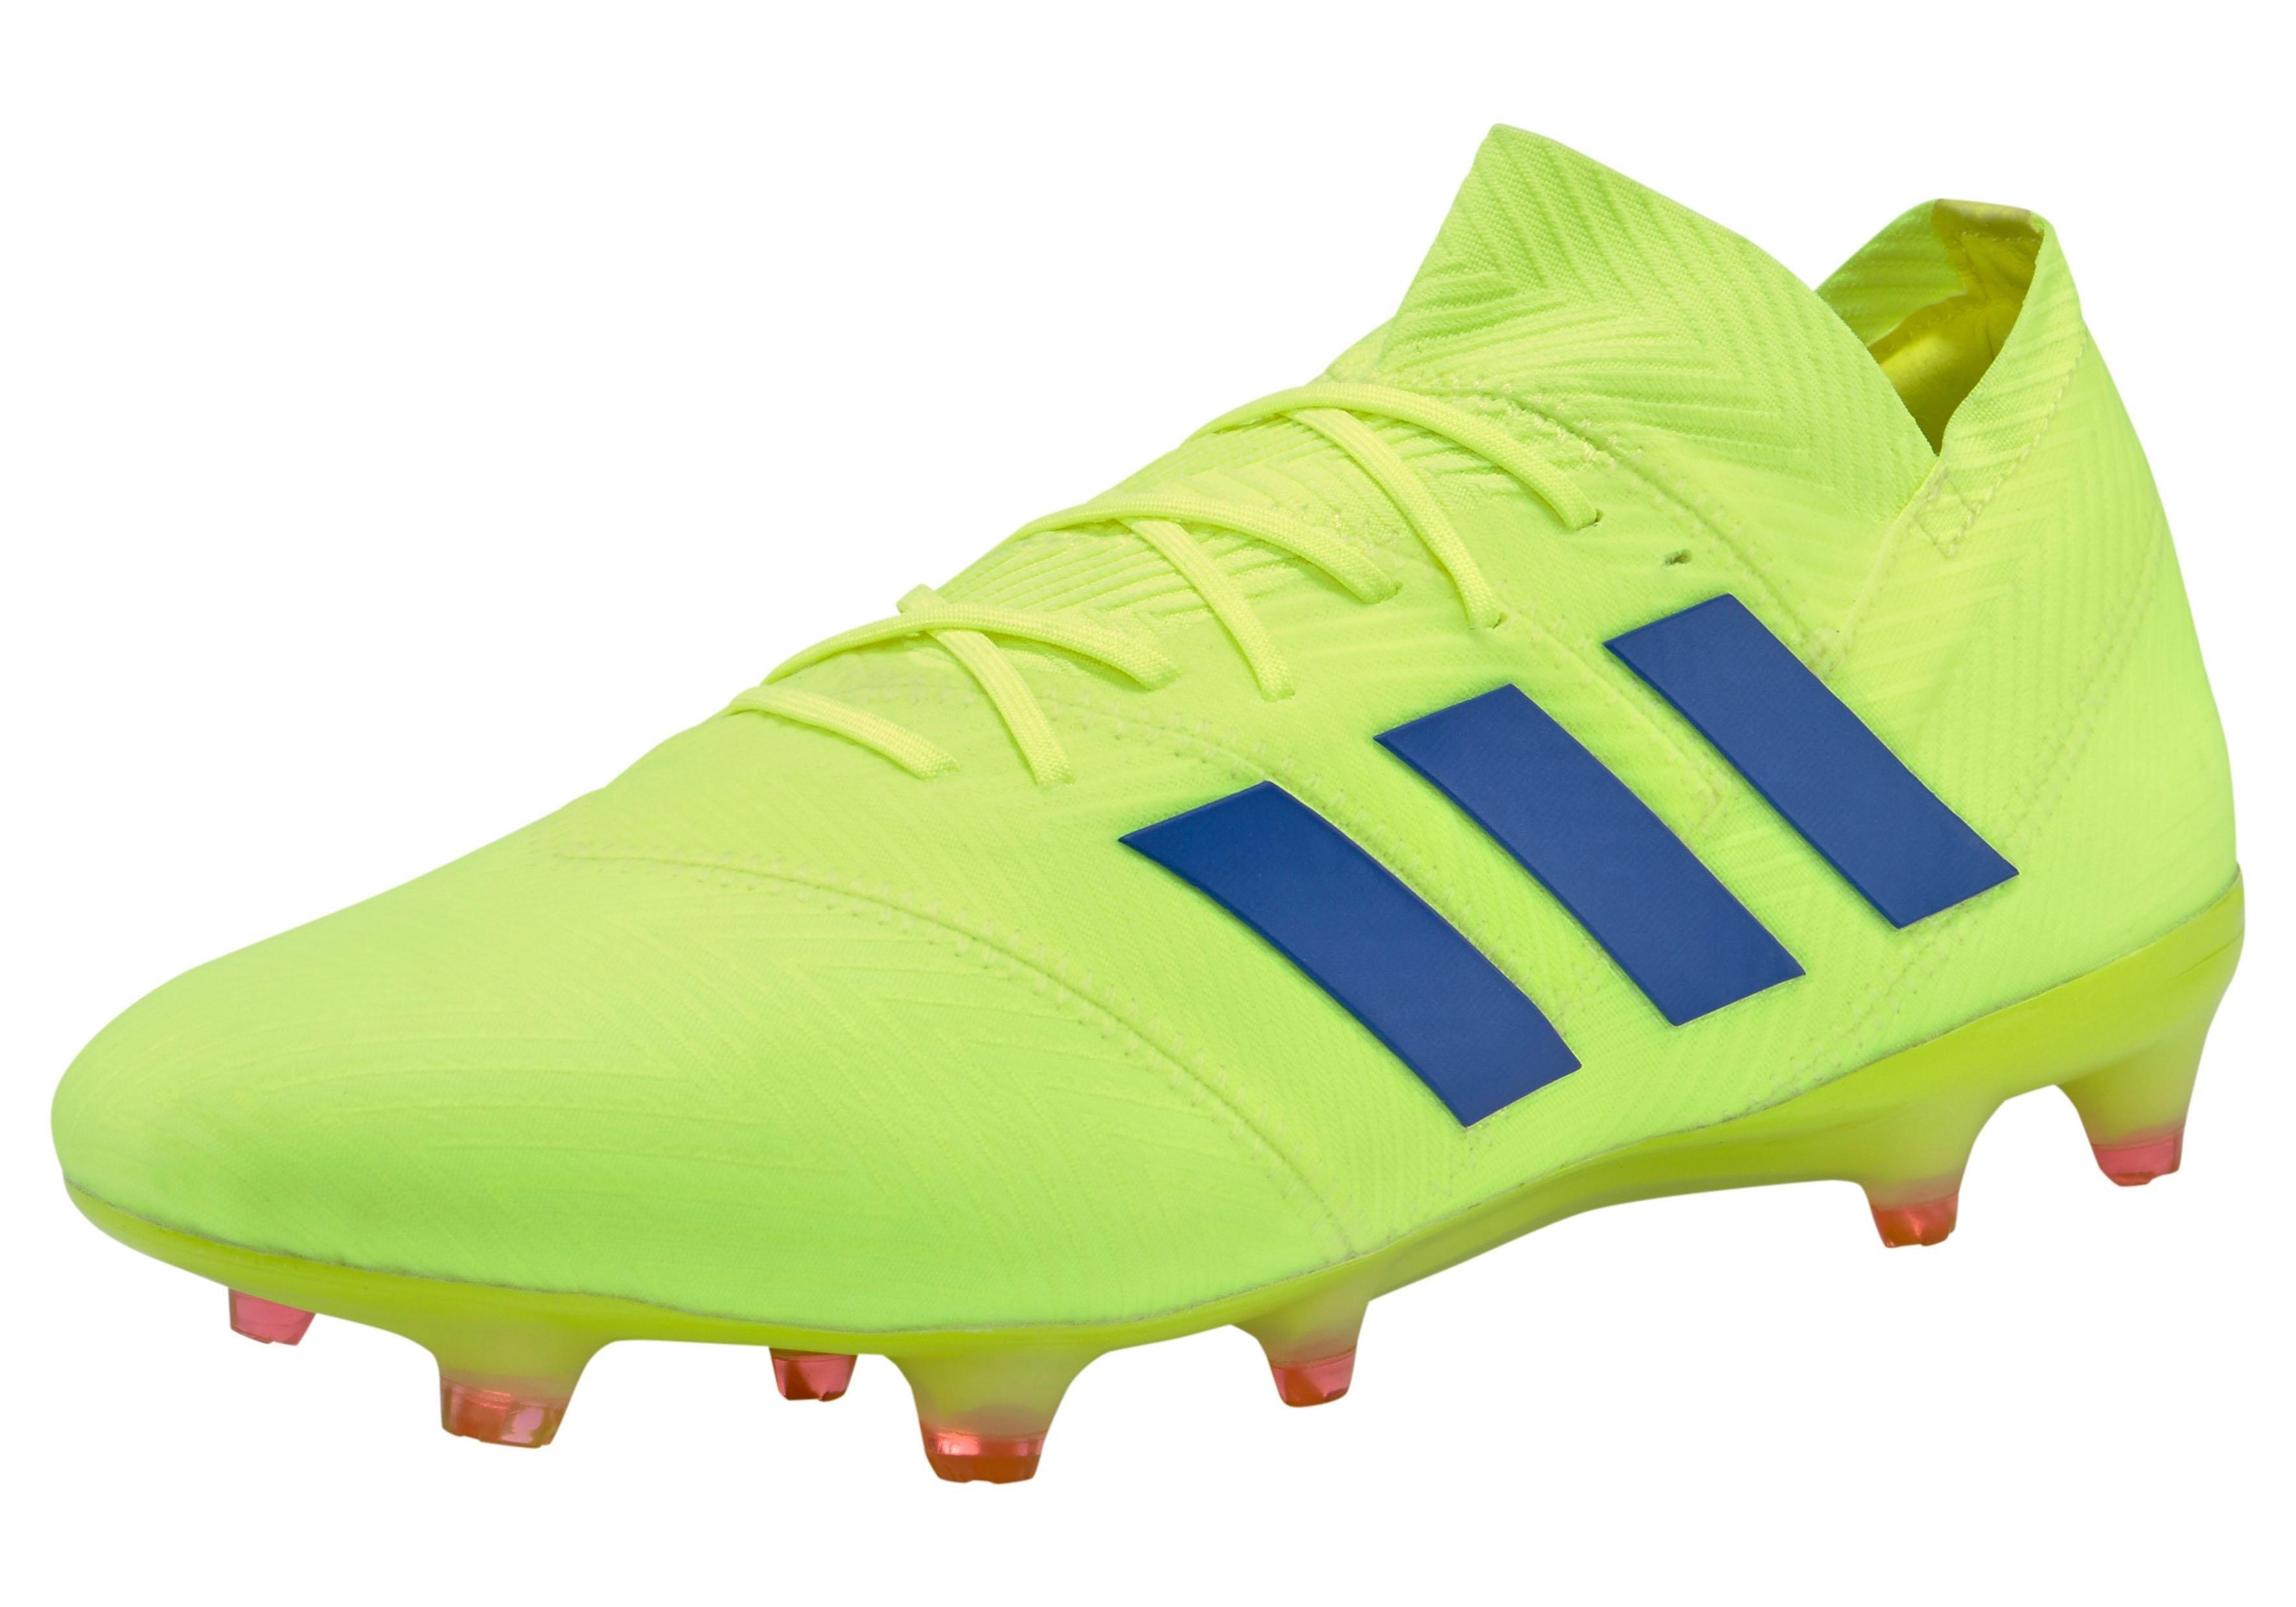 adidas Performance voetbalschoenen »Nemeziz 18.1 Fg« veilig op otto.nl kopen